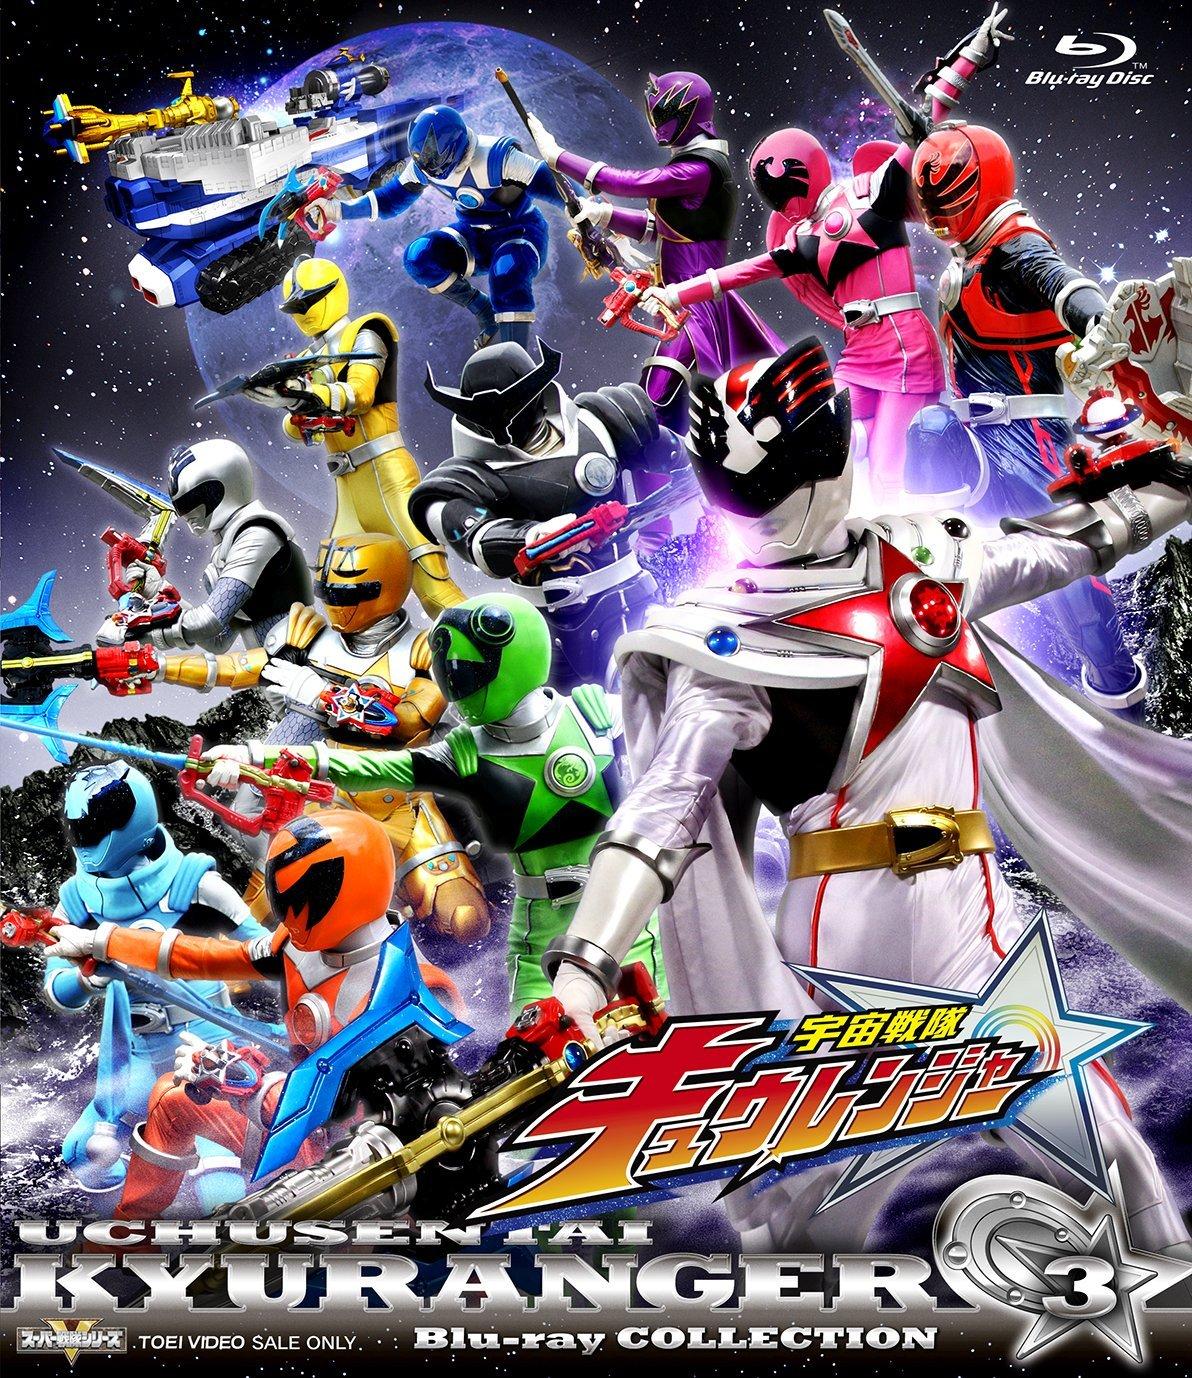 [DISCUSSION] (UCHUU KITTAA!!) Uchu Sentai Kyuranger Toy